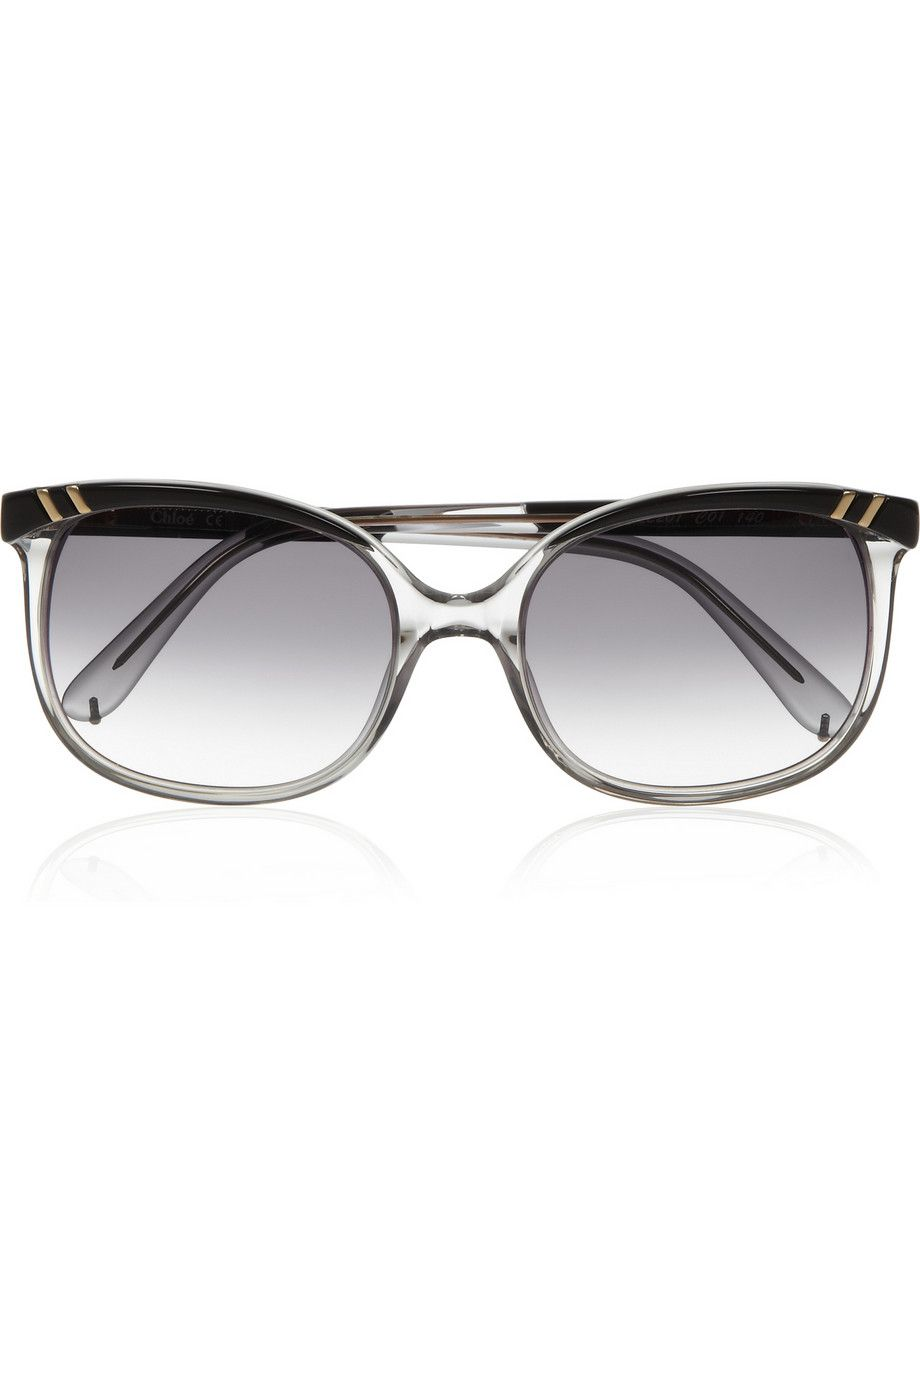 020b2154f9fa Omg, I love these sunglasses!!!! | Appearance does matter ...